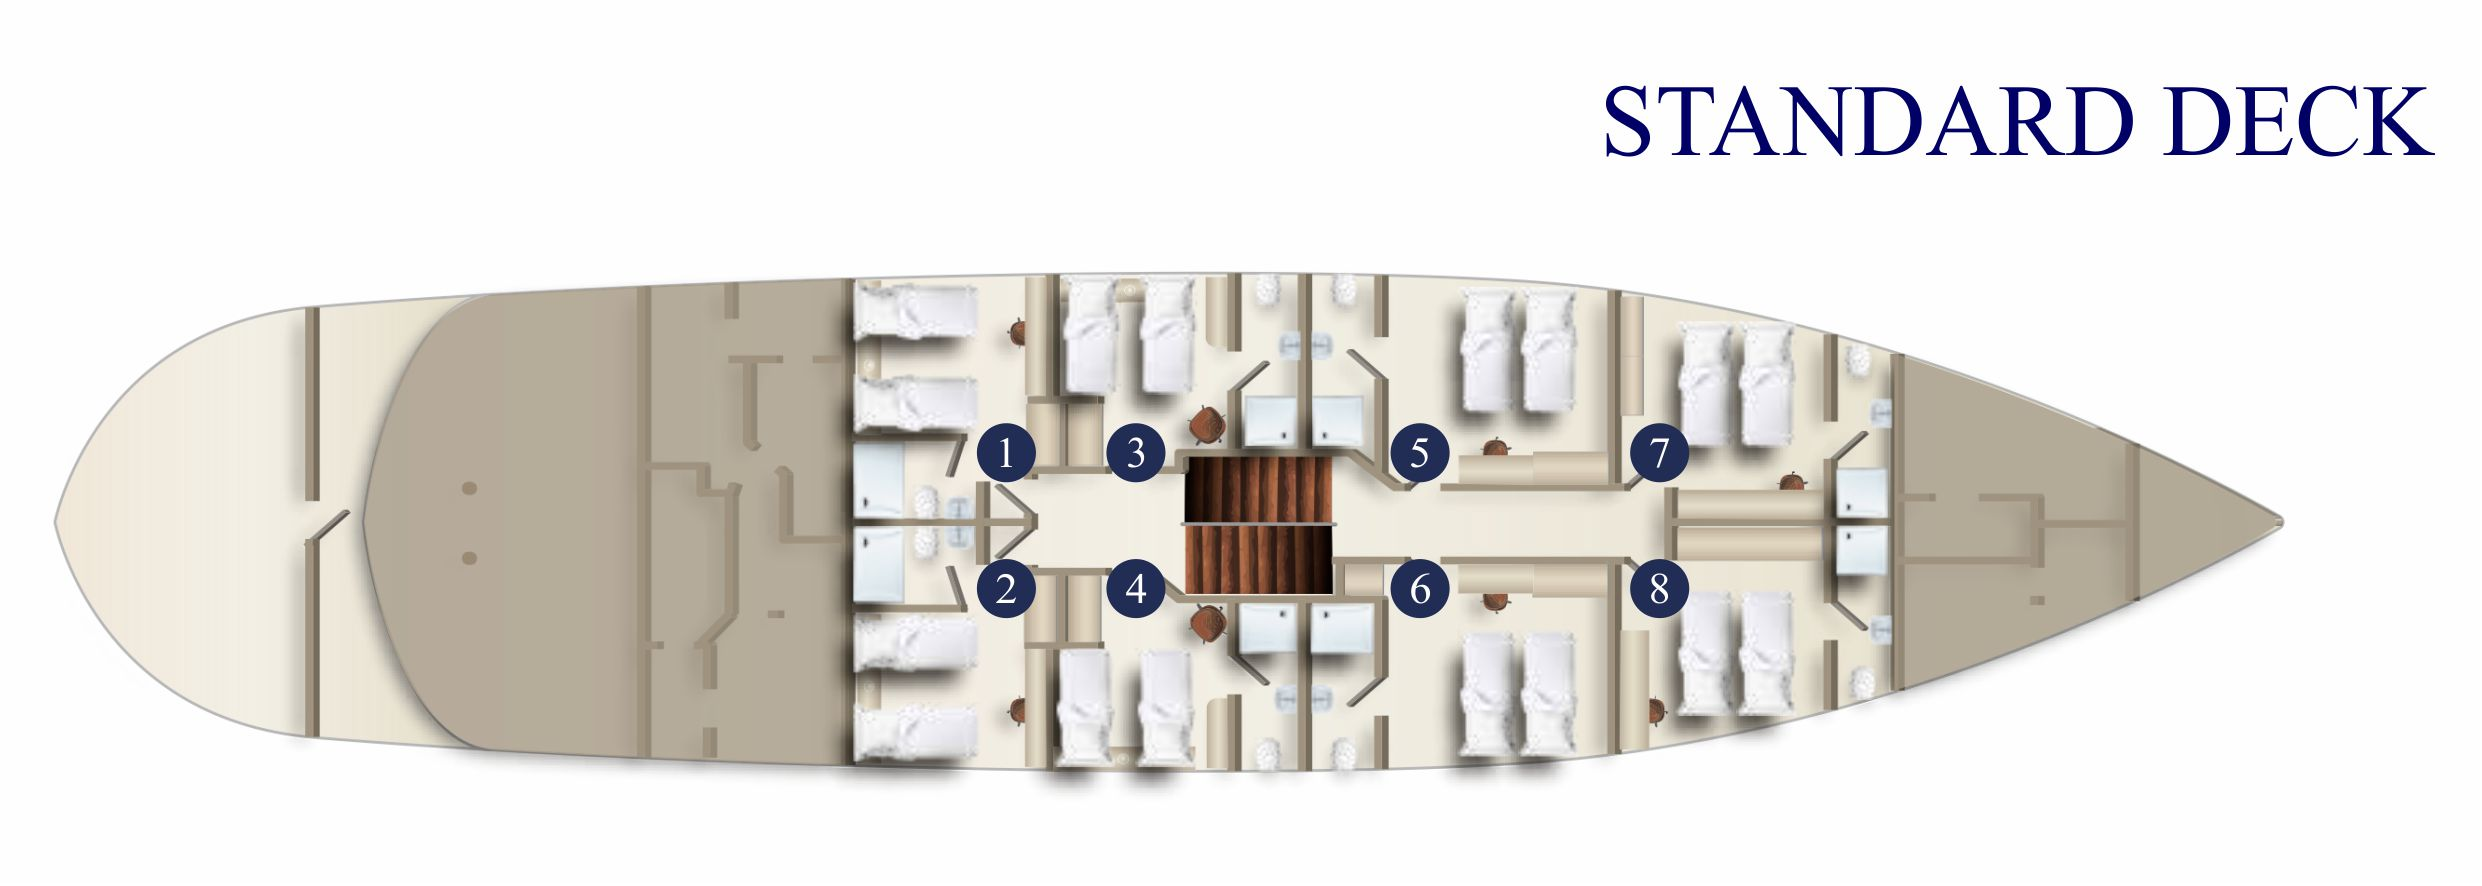 MS SAN SPIRITO standard deck